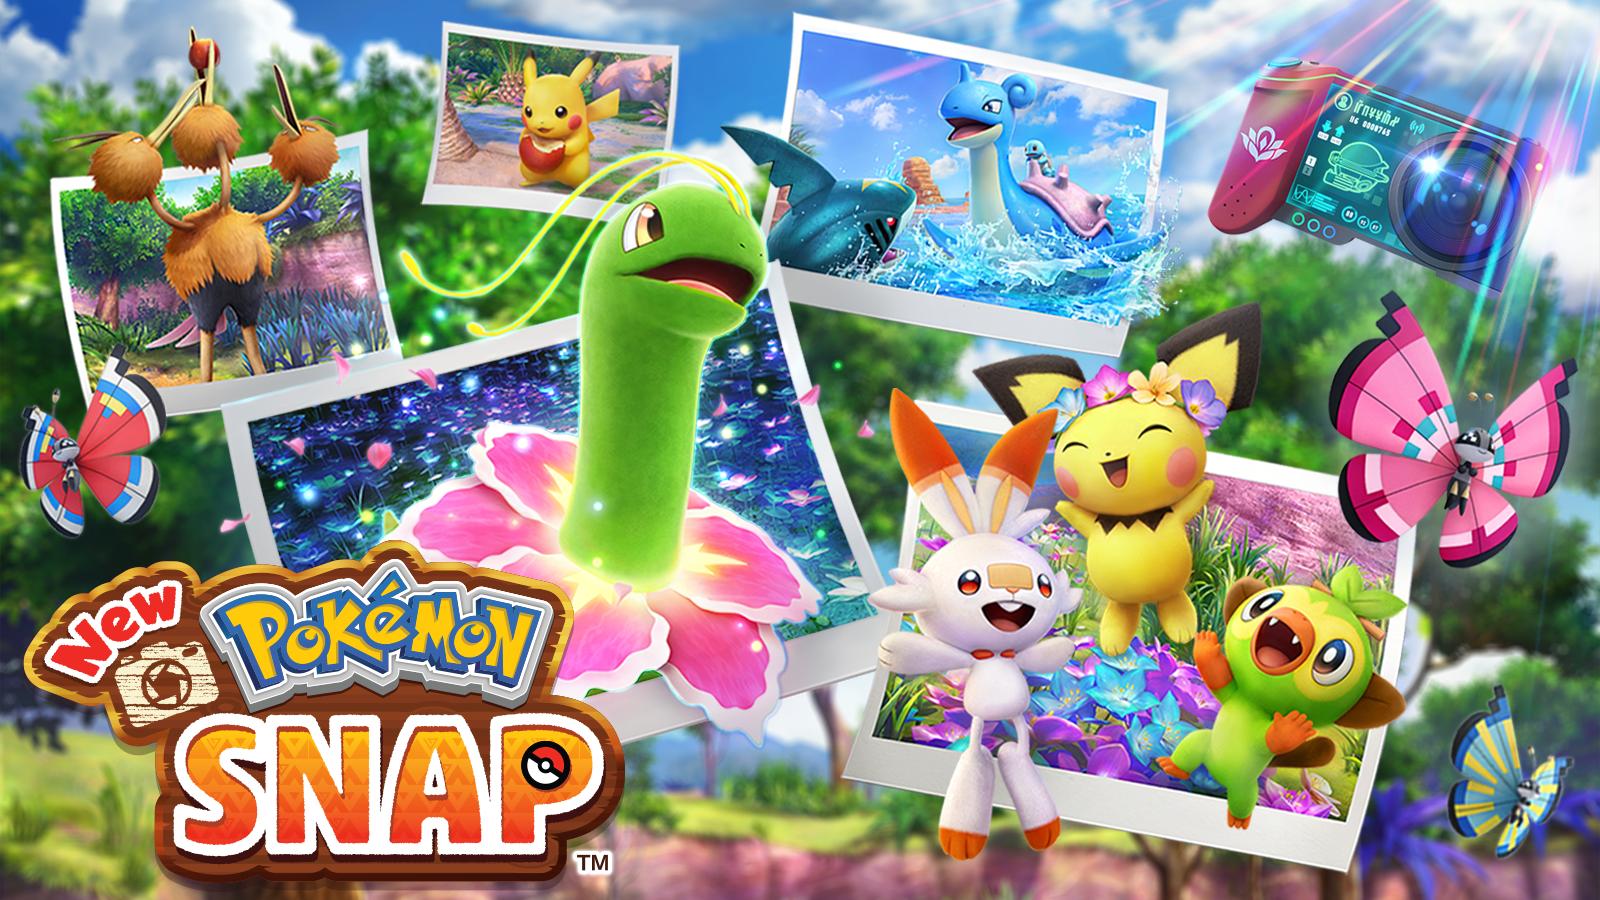 New Pokémon Snap: Pocket Monster Photo Safari for the Switch